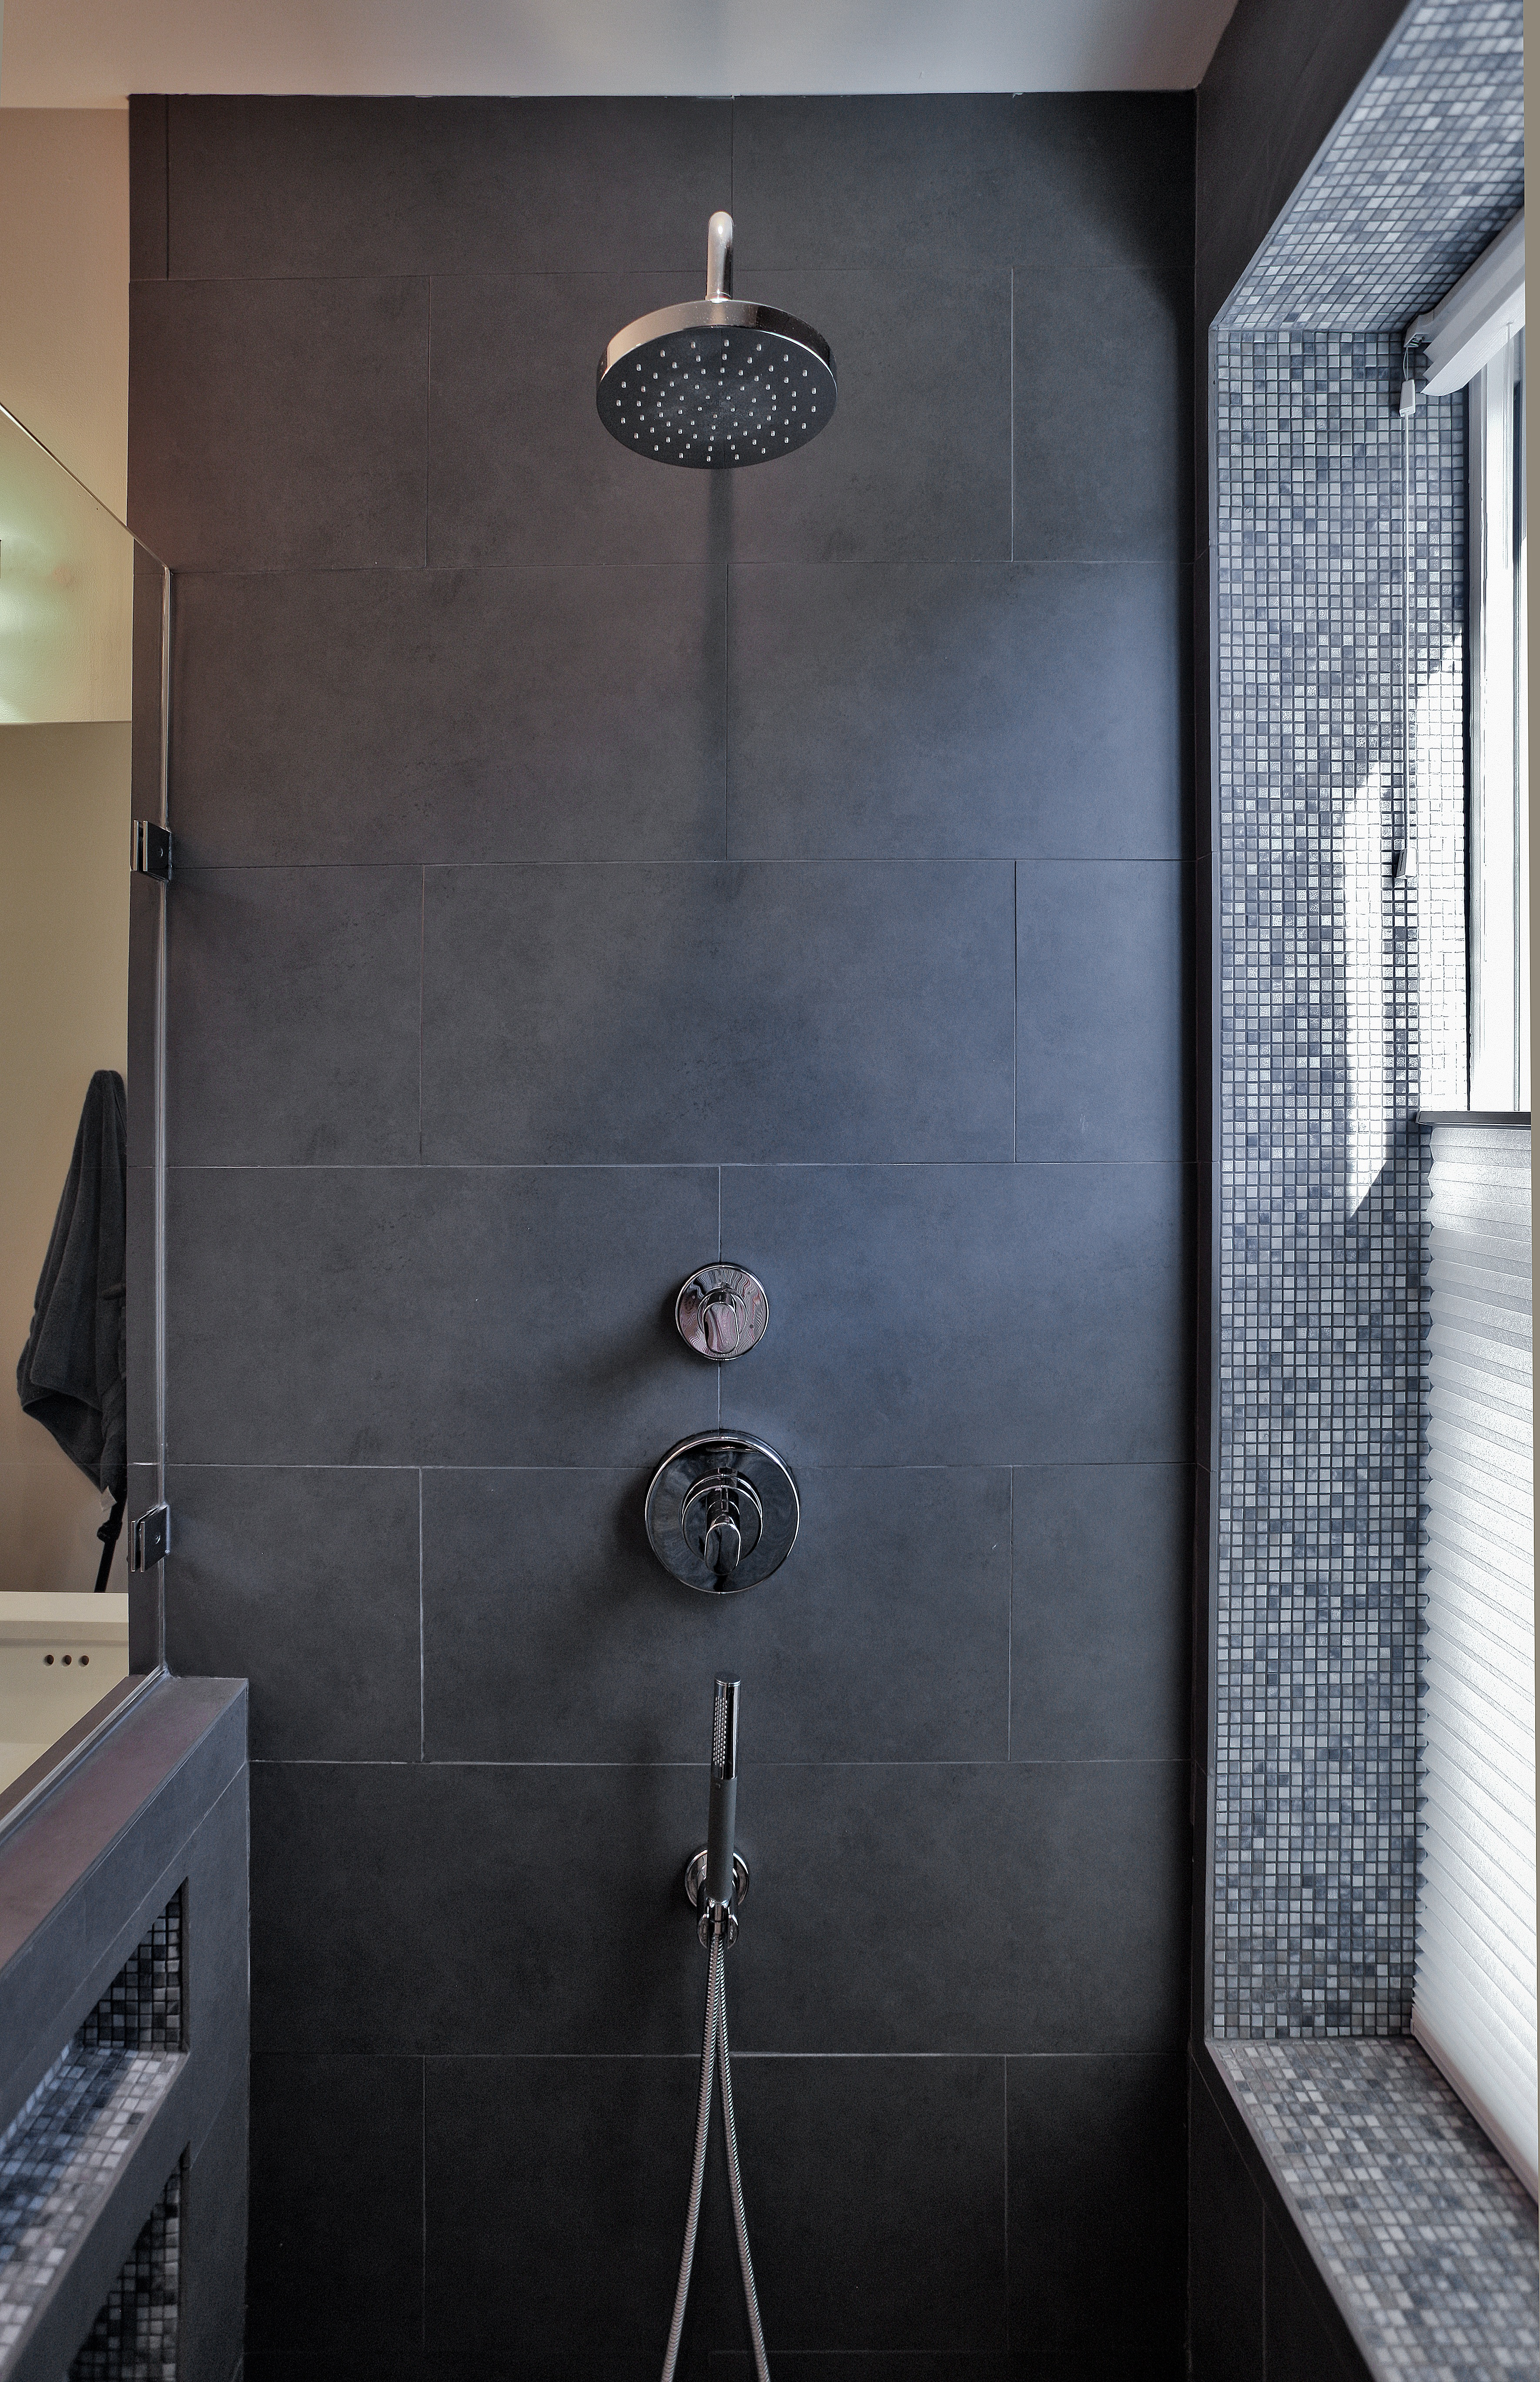 Bathroom Renovations Kingston Ontario: Washington DC Bath Remodeling